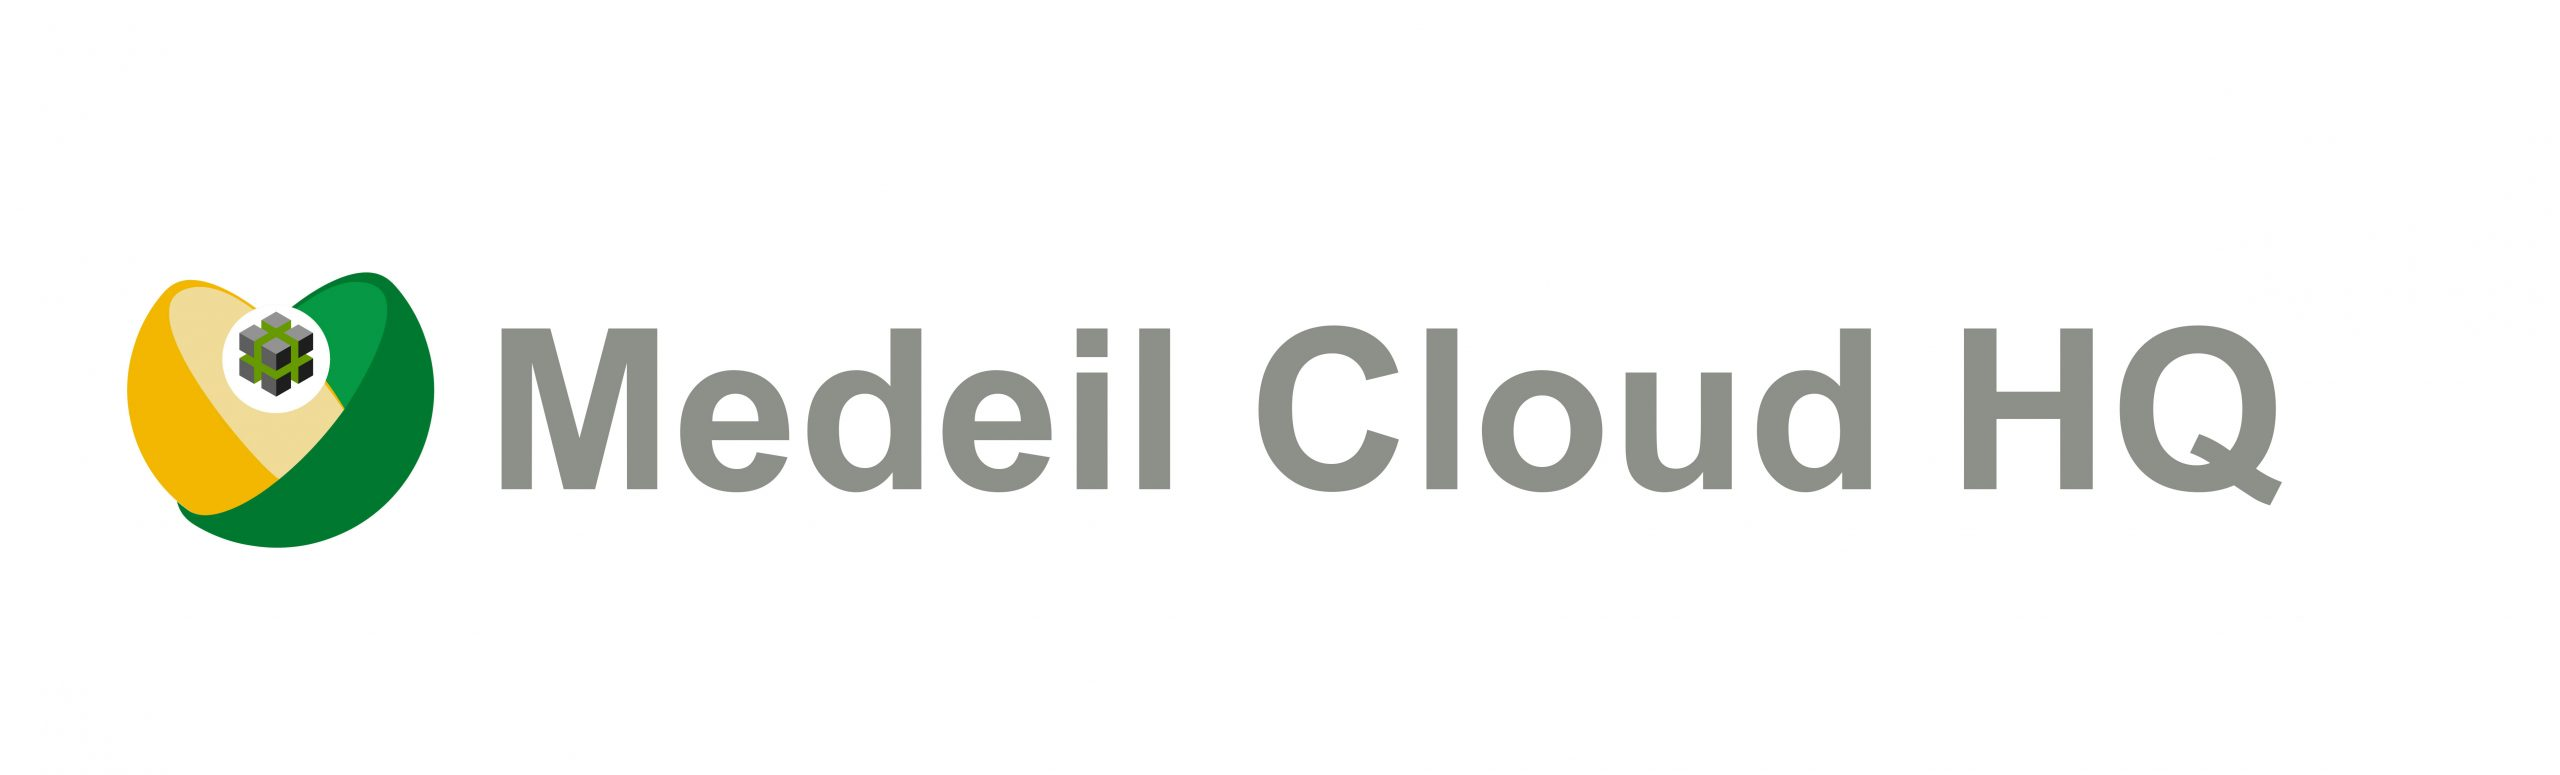 Medeil cloud hq